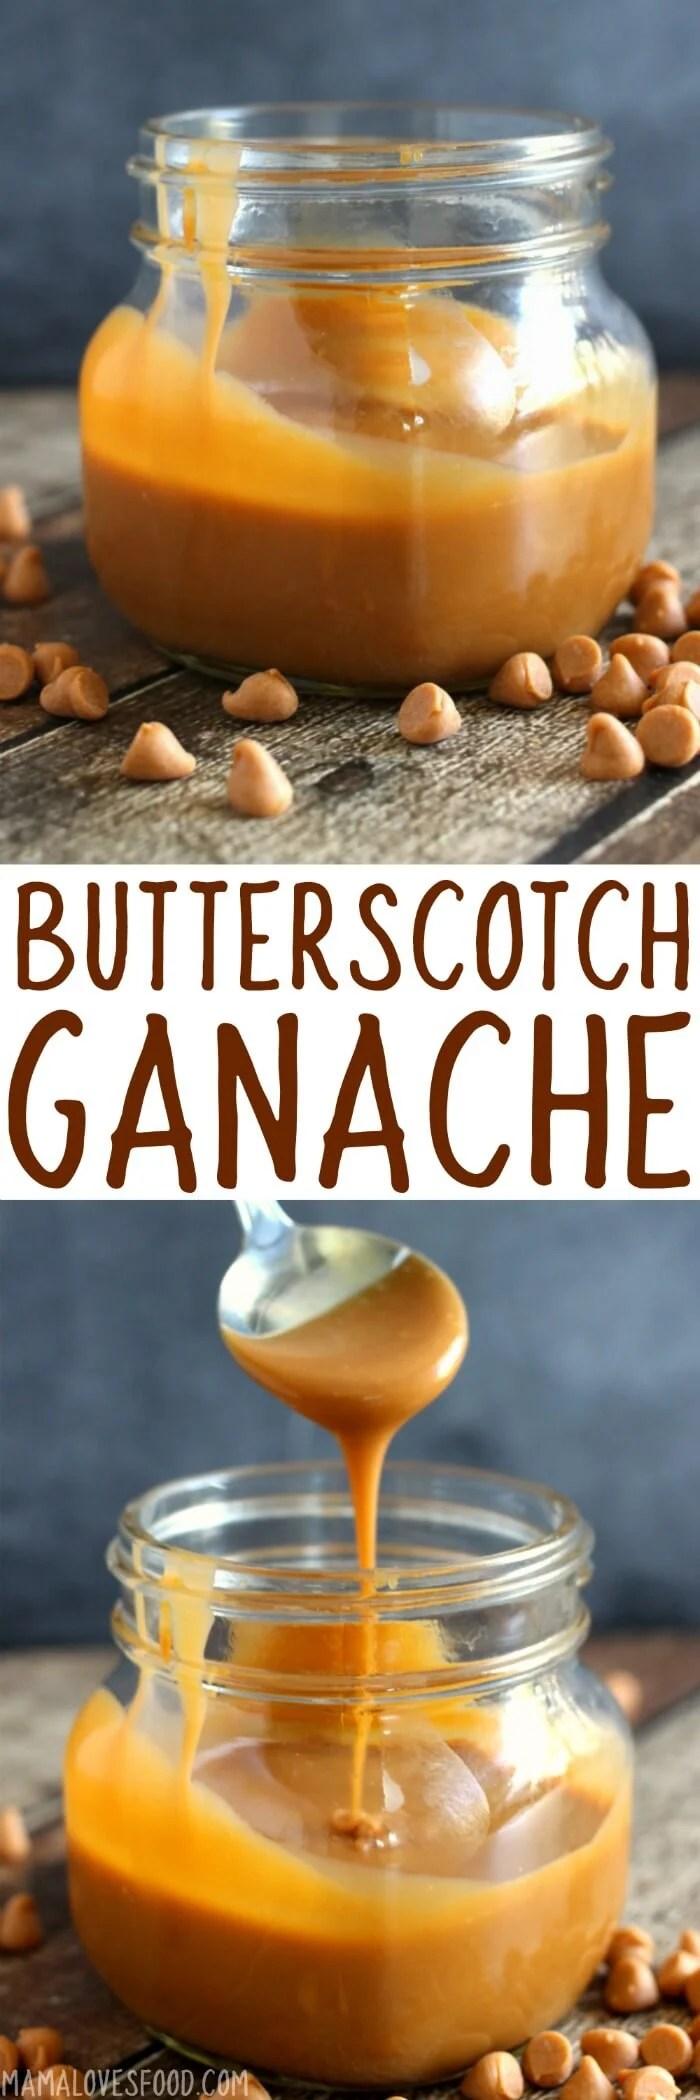 Easy Butterscotch Ganache